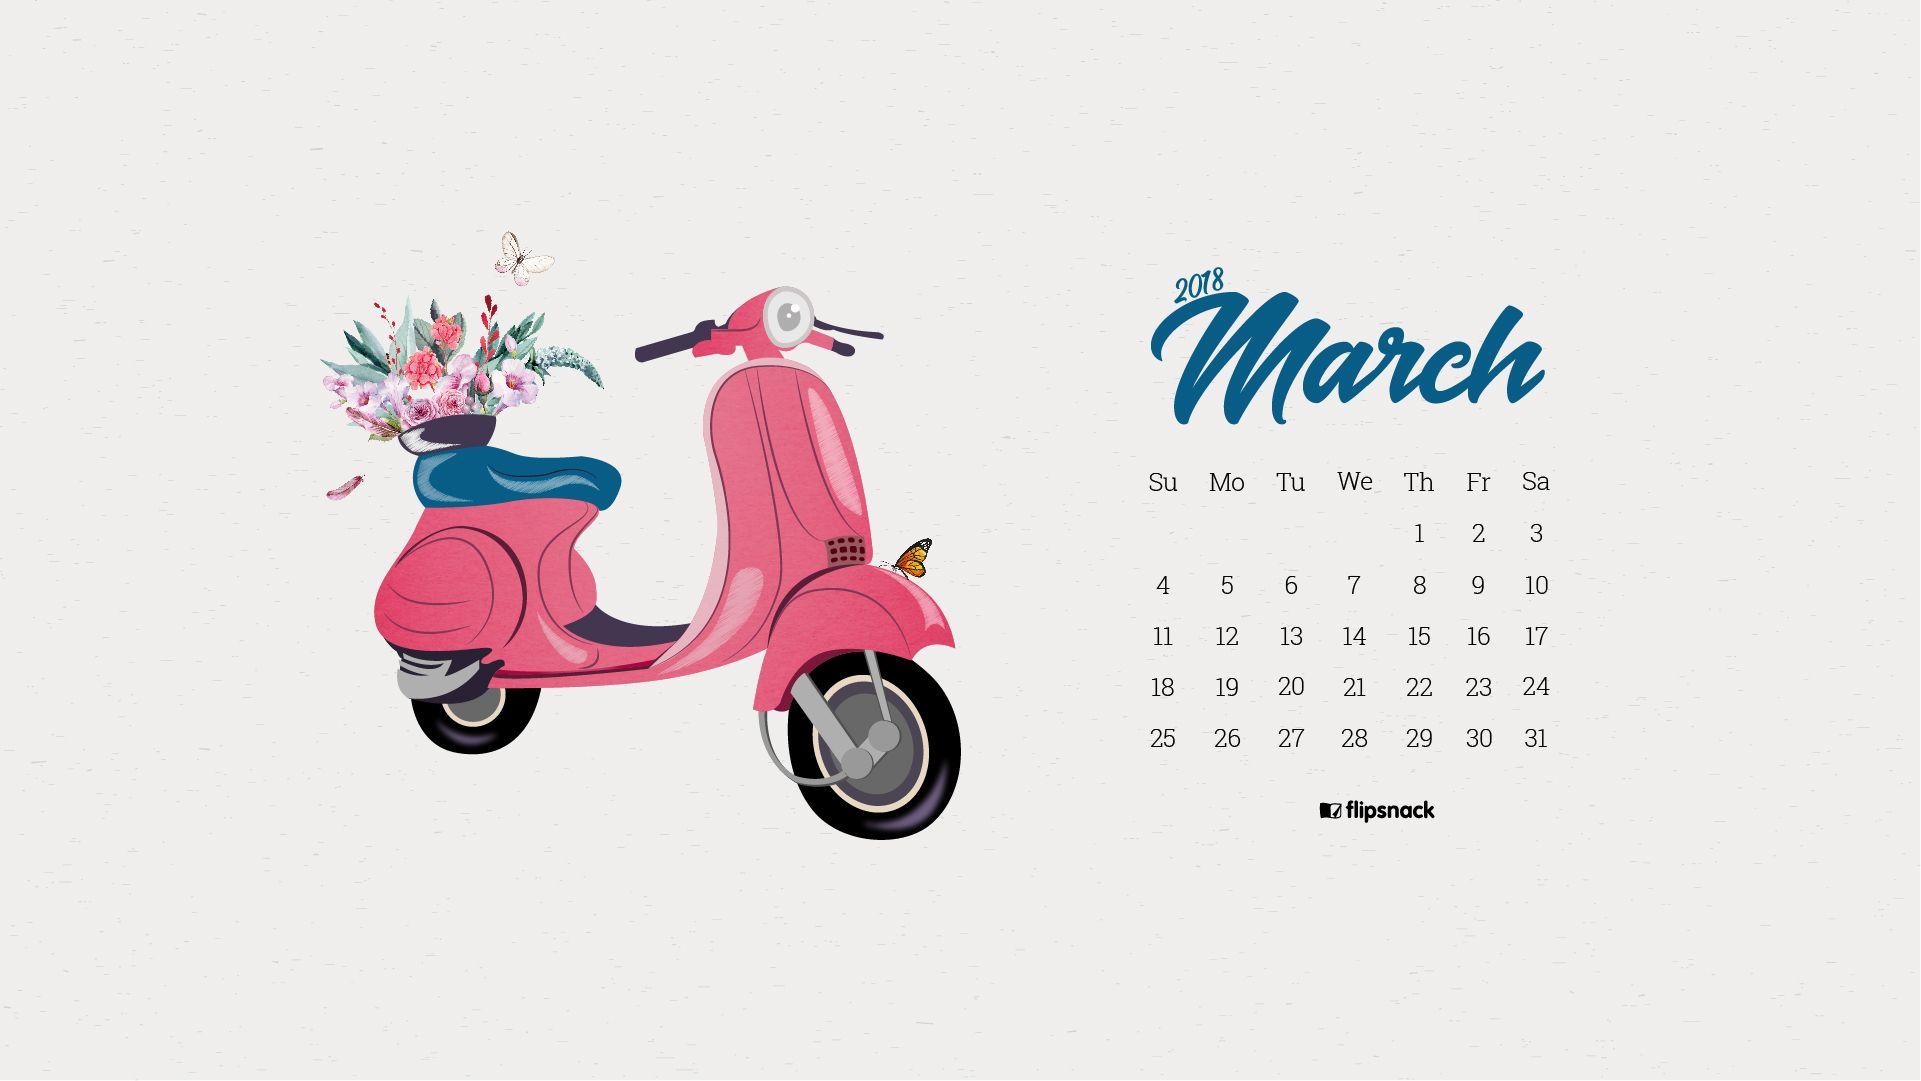 March 2018 free wallpaper calendar for desktop background